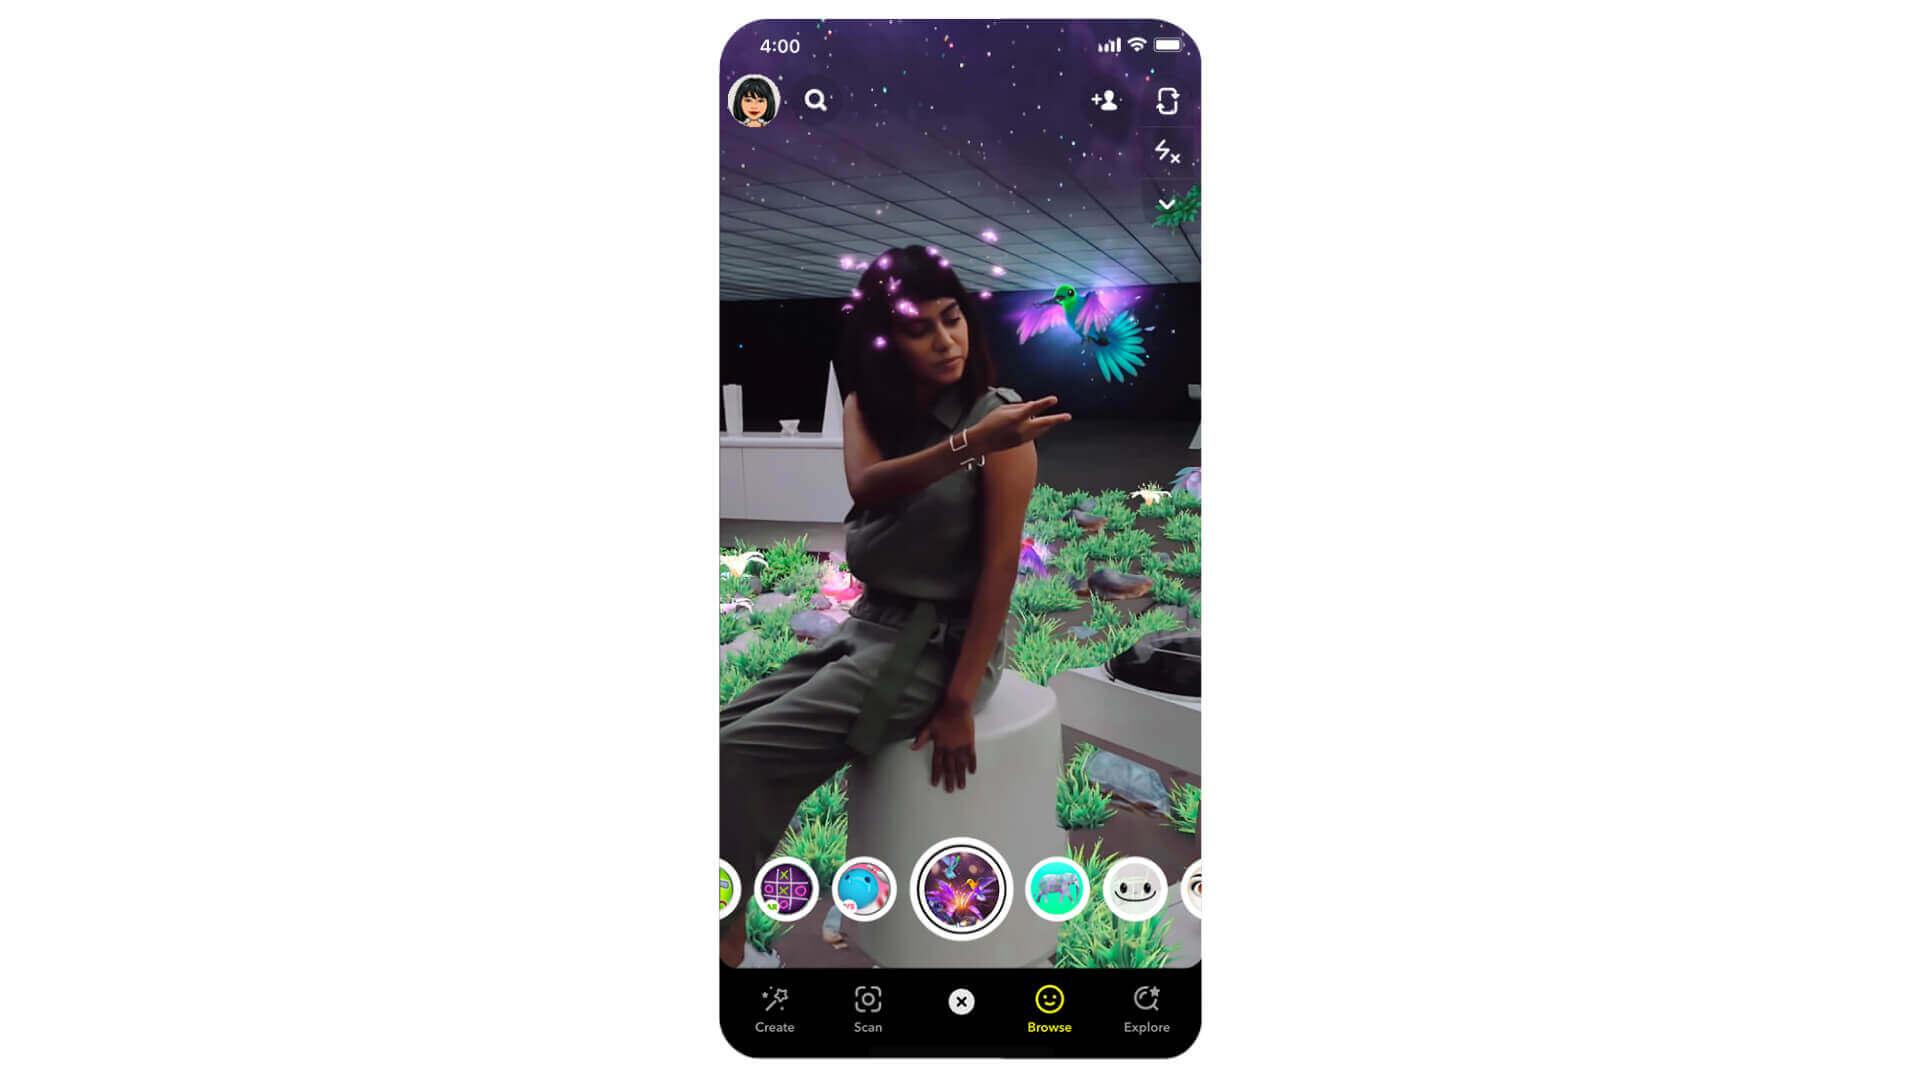 Snapchat-Lidar-Lenses-iphone12-lidar-scanner